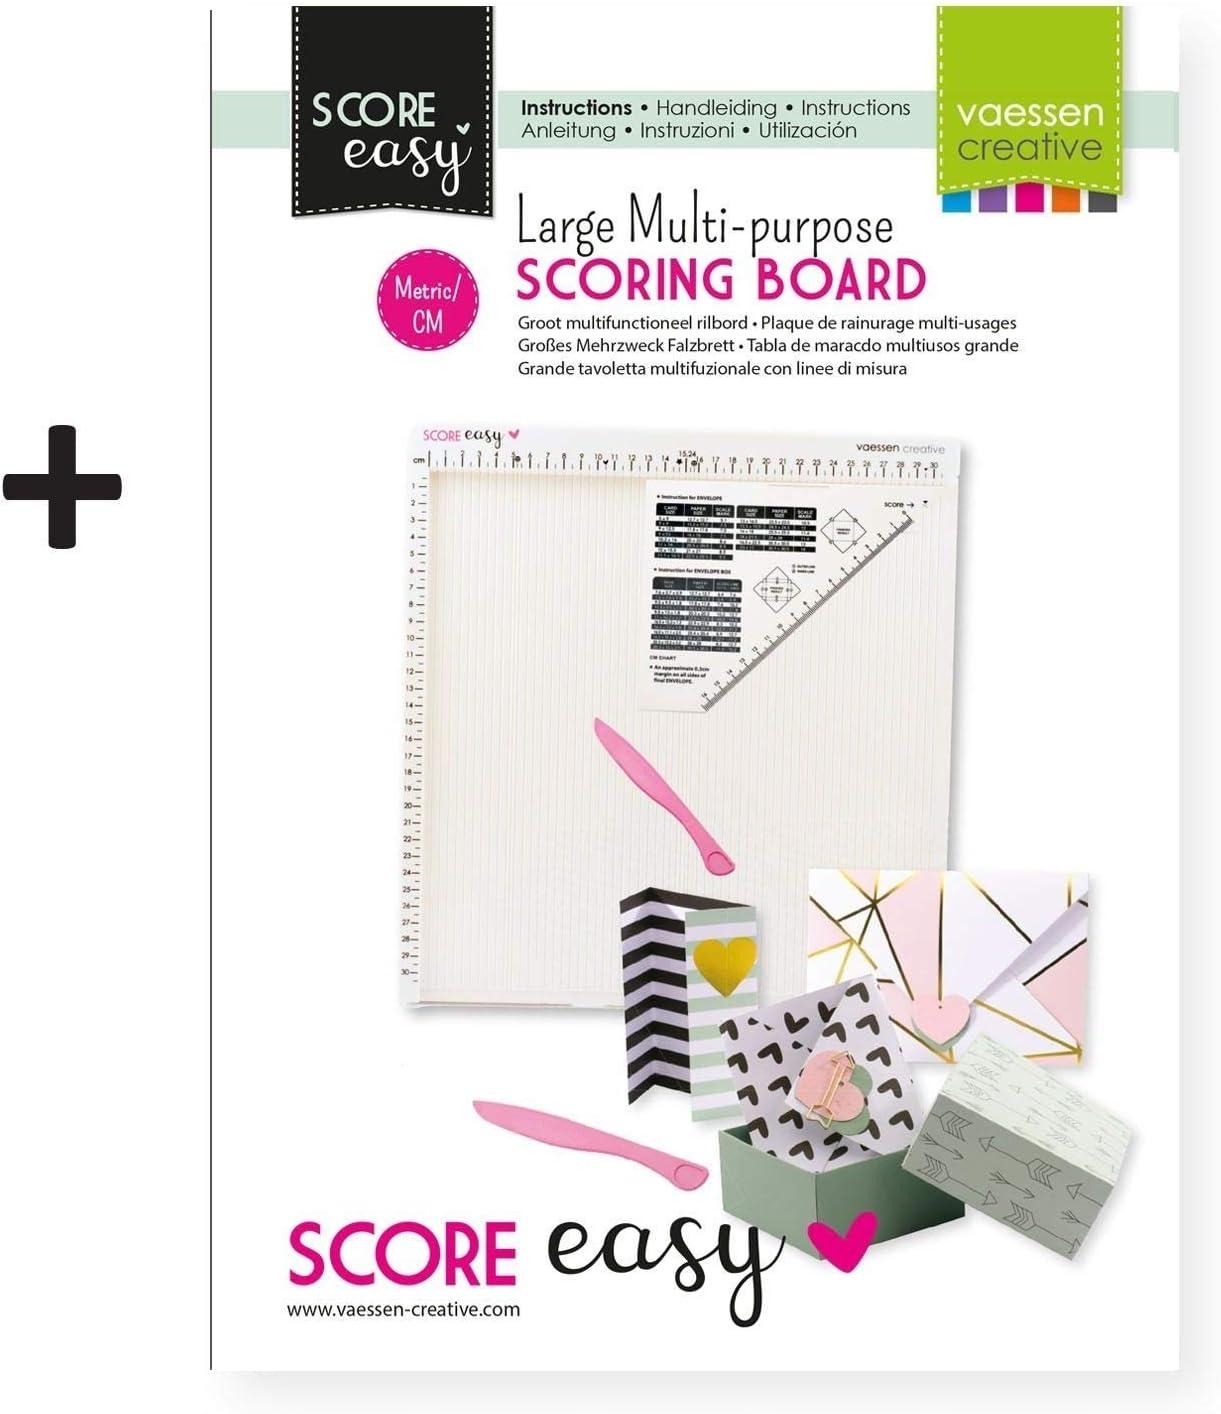 Amazon.com: Vaessen Creative 2137-047 Easy Scoring Board cm ...